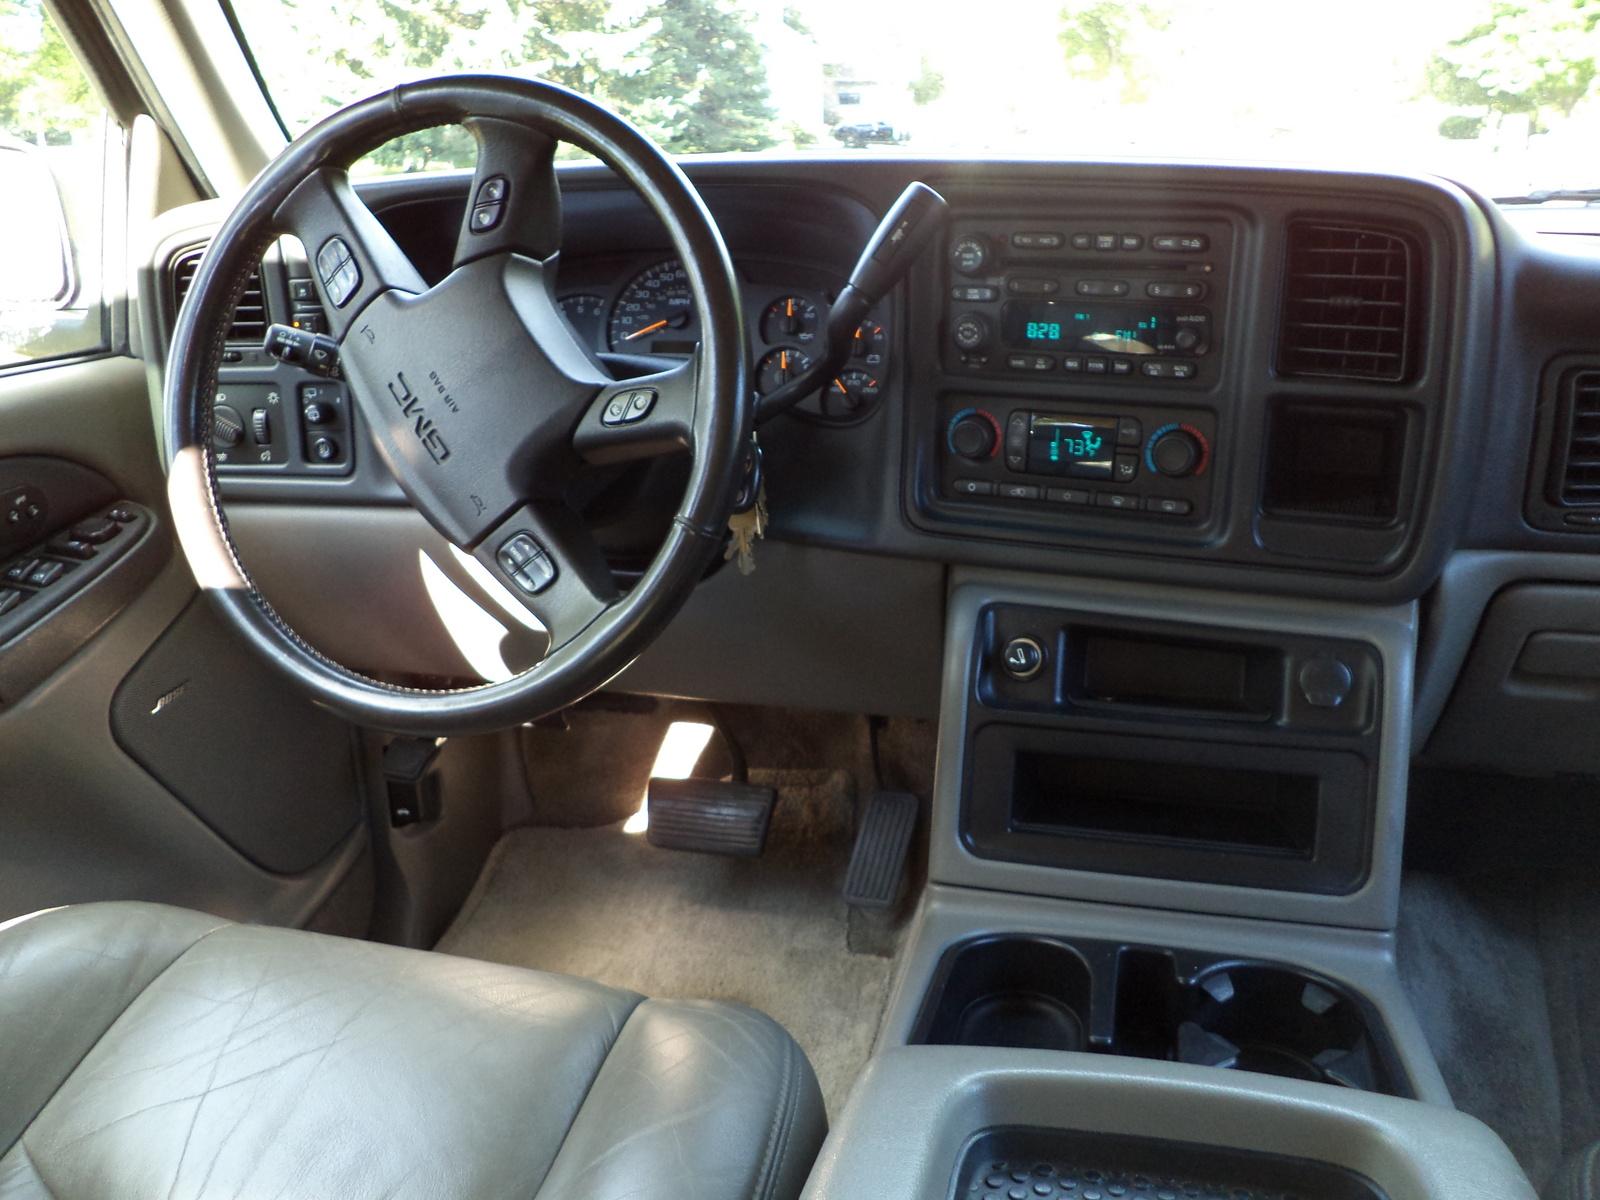 2003 GMC Yukon SLT Interior